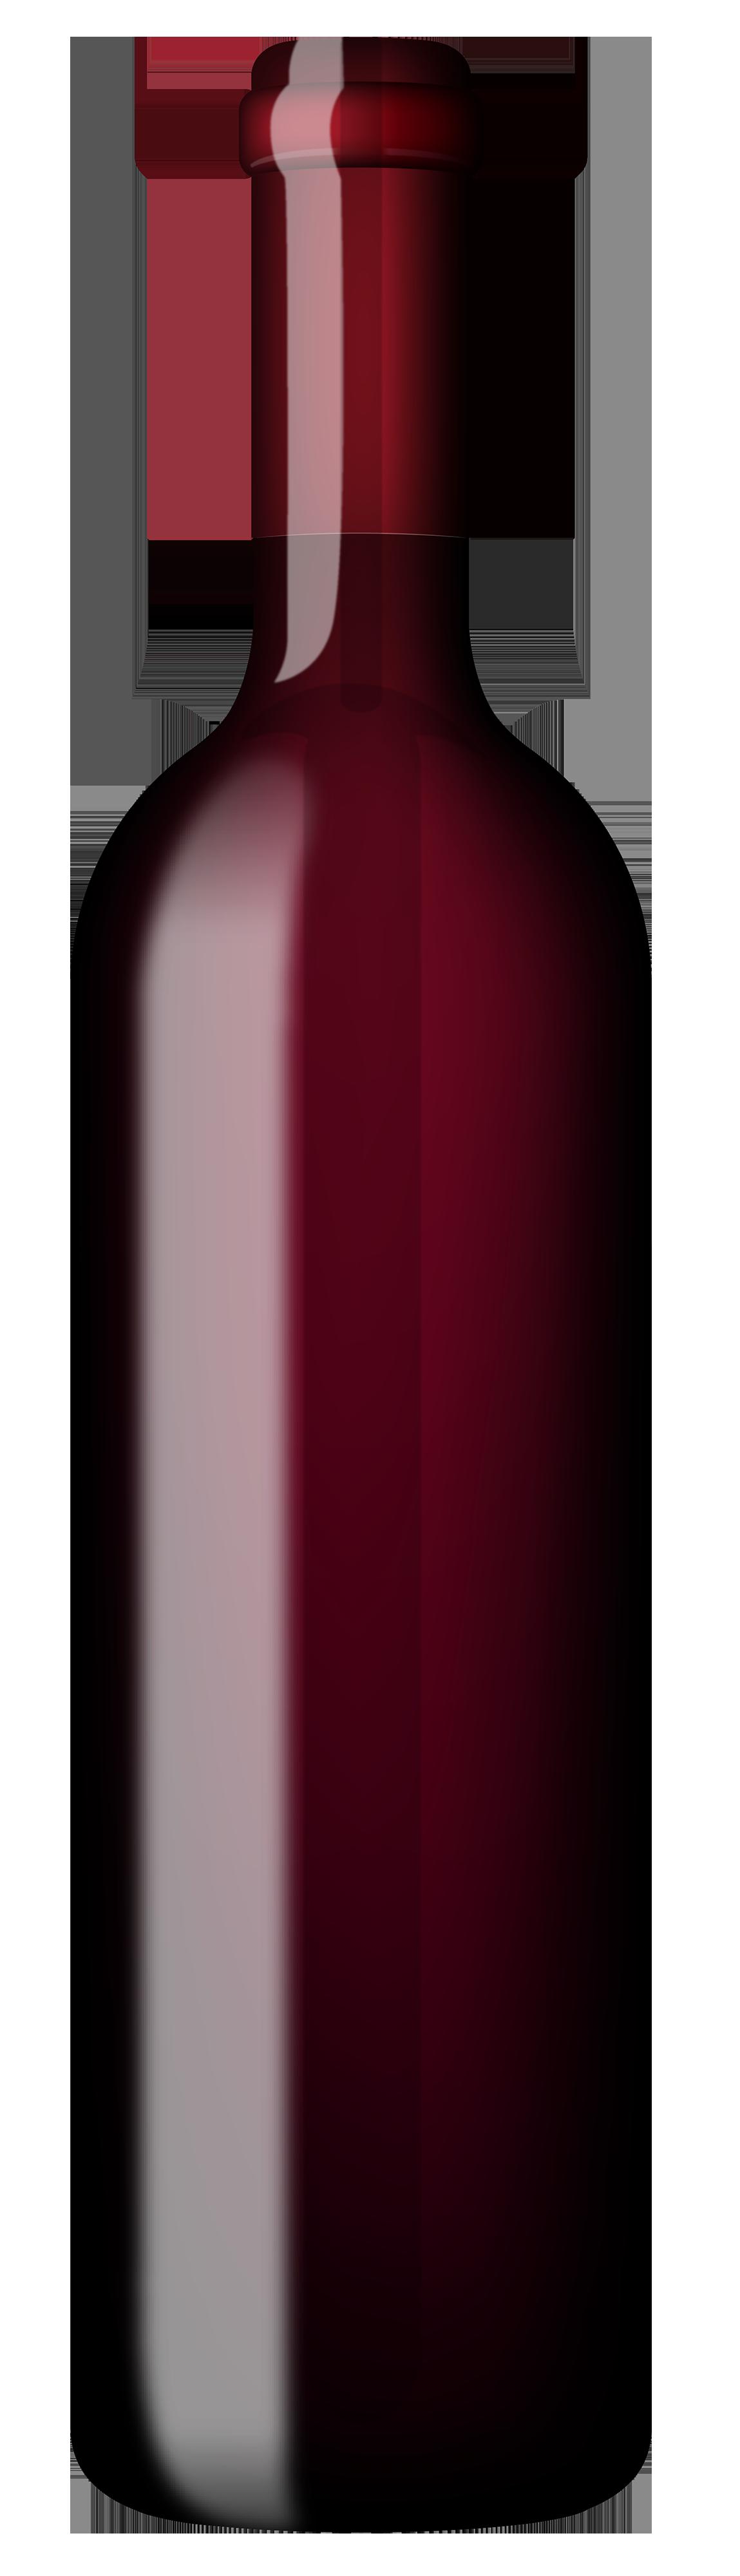 Wine bottle download wine clip art free -Wine bottle download wine clip art free clipart of wine glasses-13